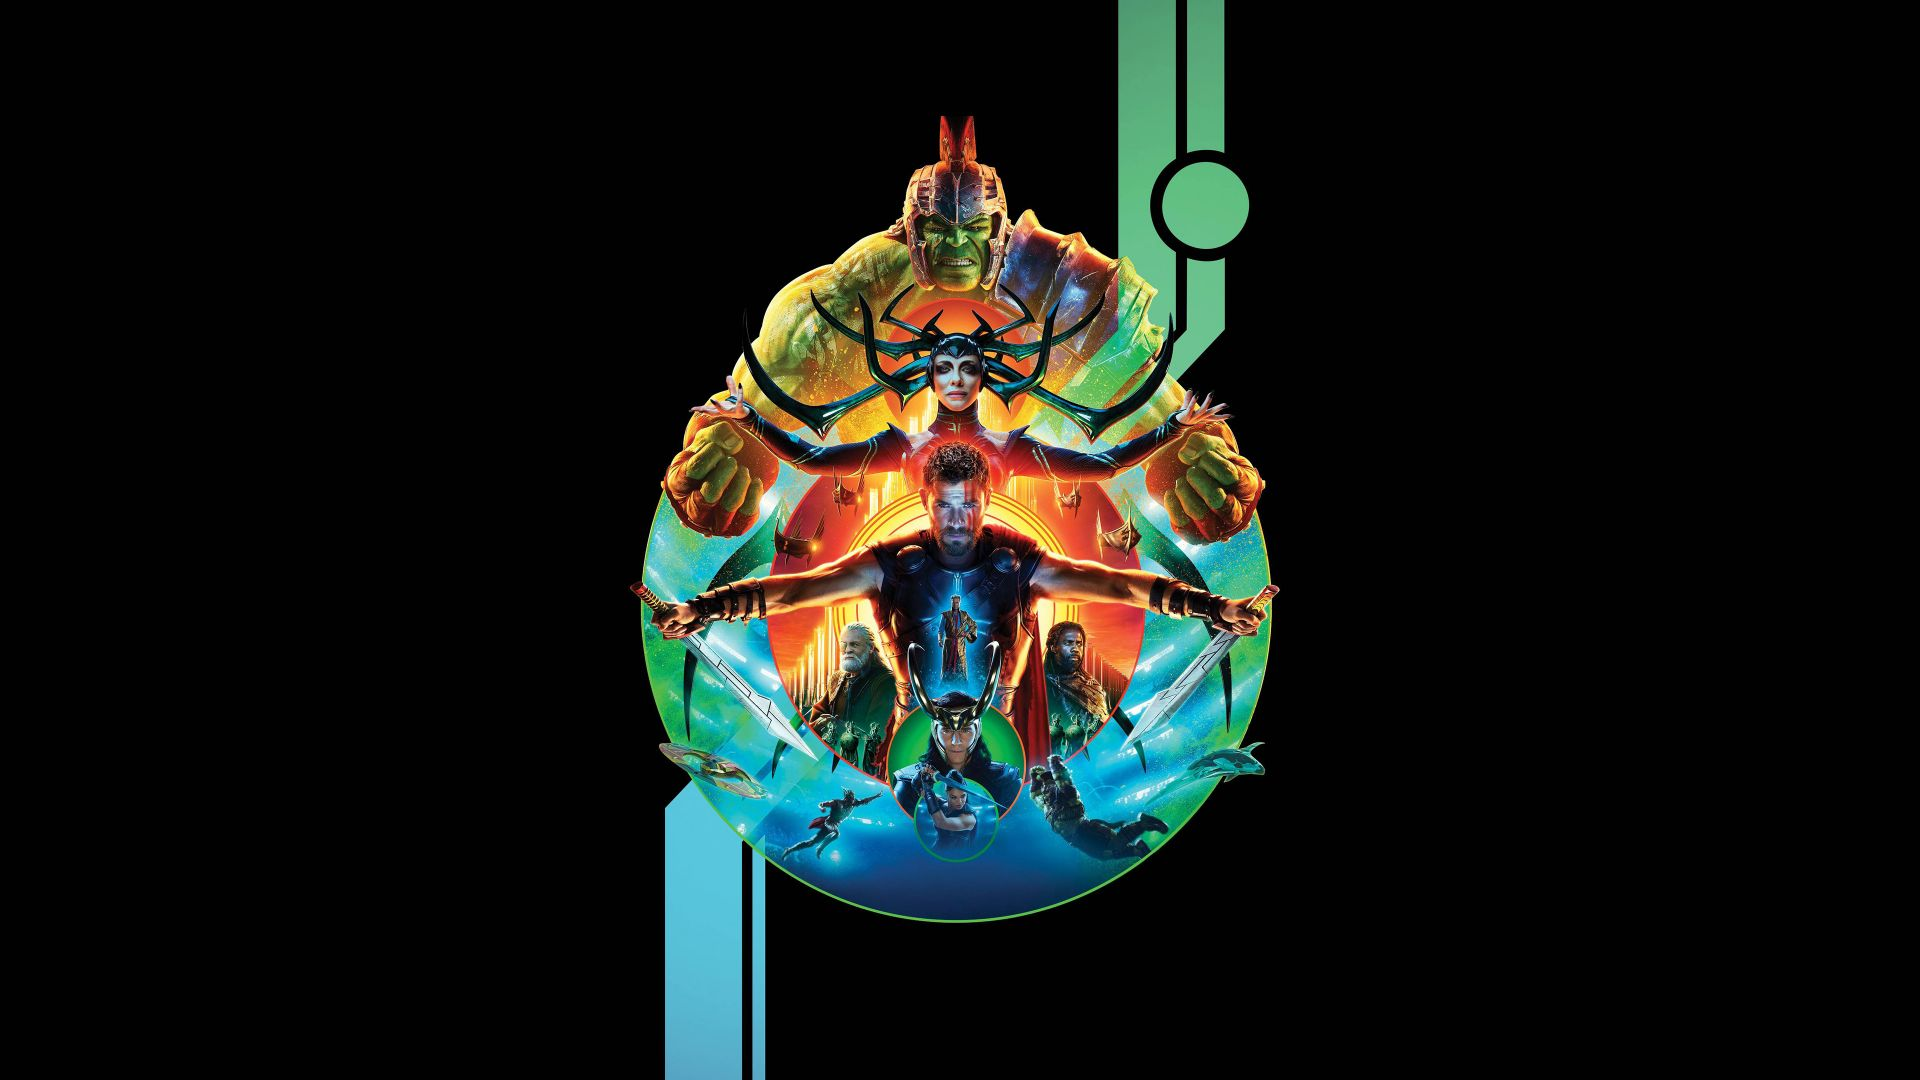 Wallpaper Thor: Ragnarok, Hulk, Thor, movie, poster, 4k